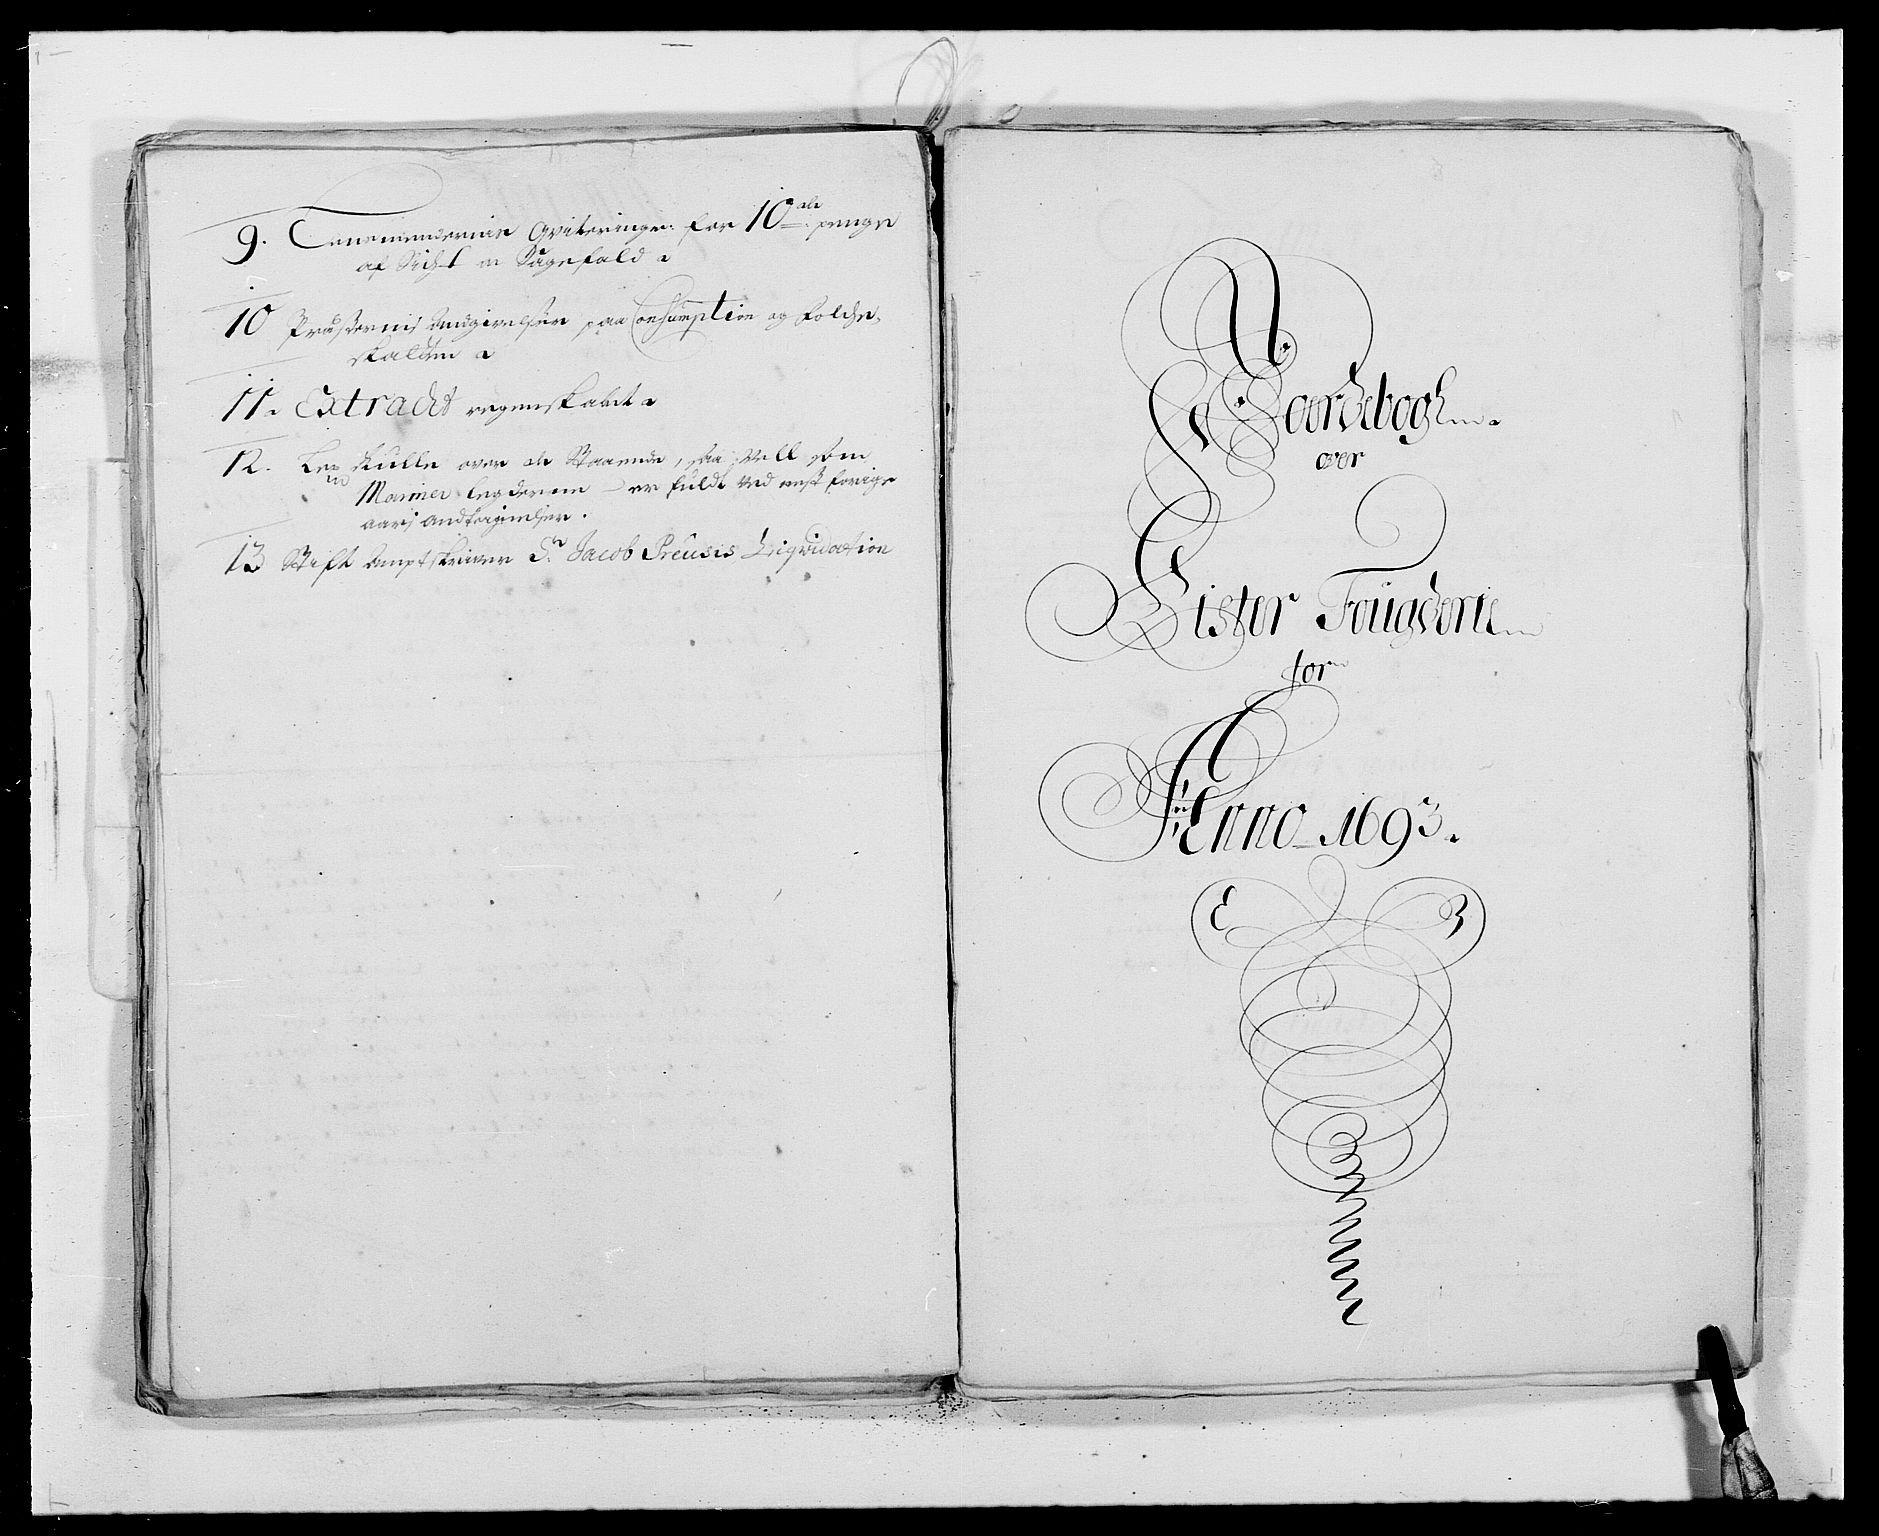 RA, Rentekammeret inntil 1814, Reviderte regnskaper, Fogderegnskap, R41/L2536: Fogderegnskap Lista, 1690-1693, s. 428